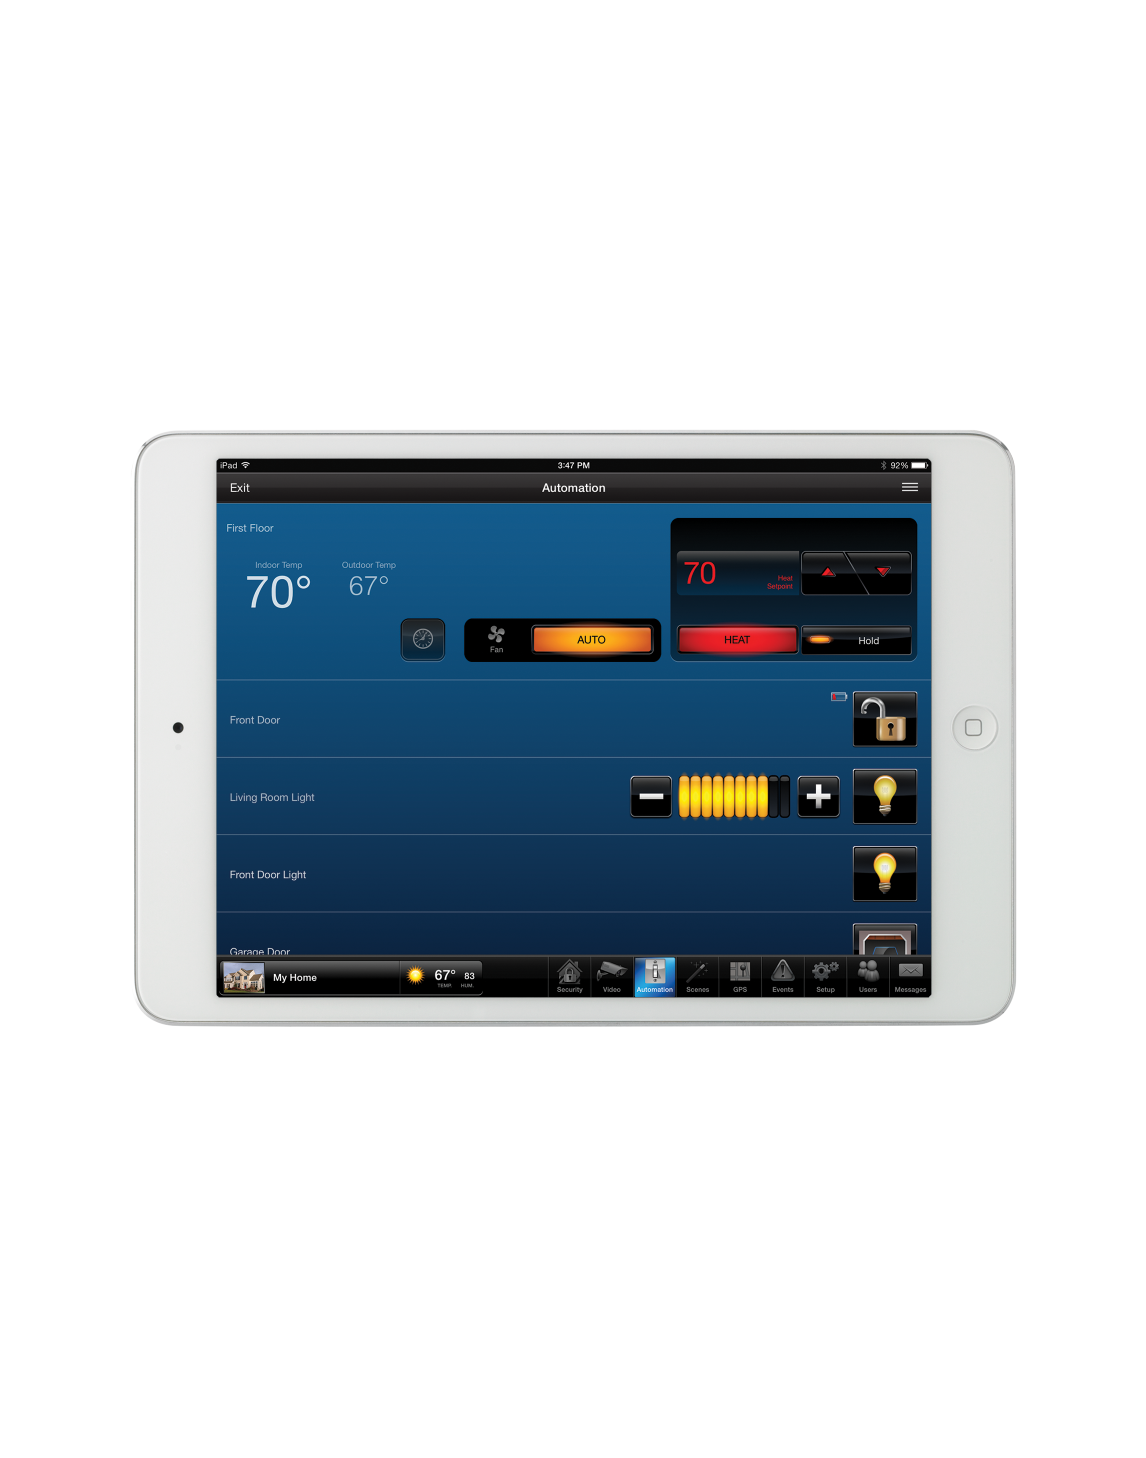 Thermostats Rochester Buffalo Erie Albany Syracuse